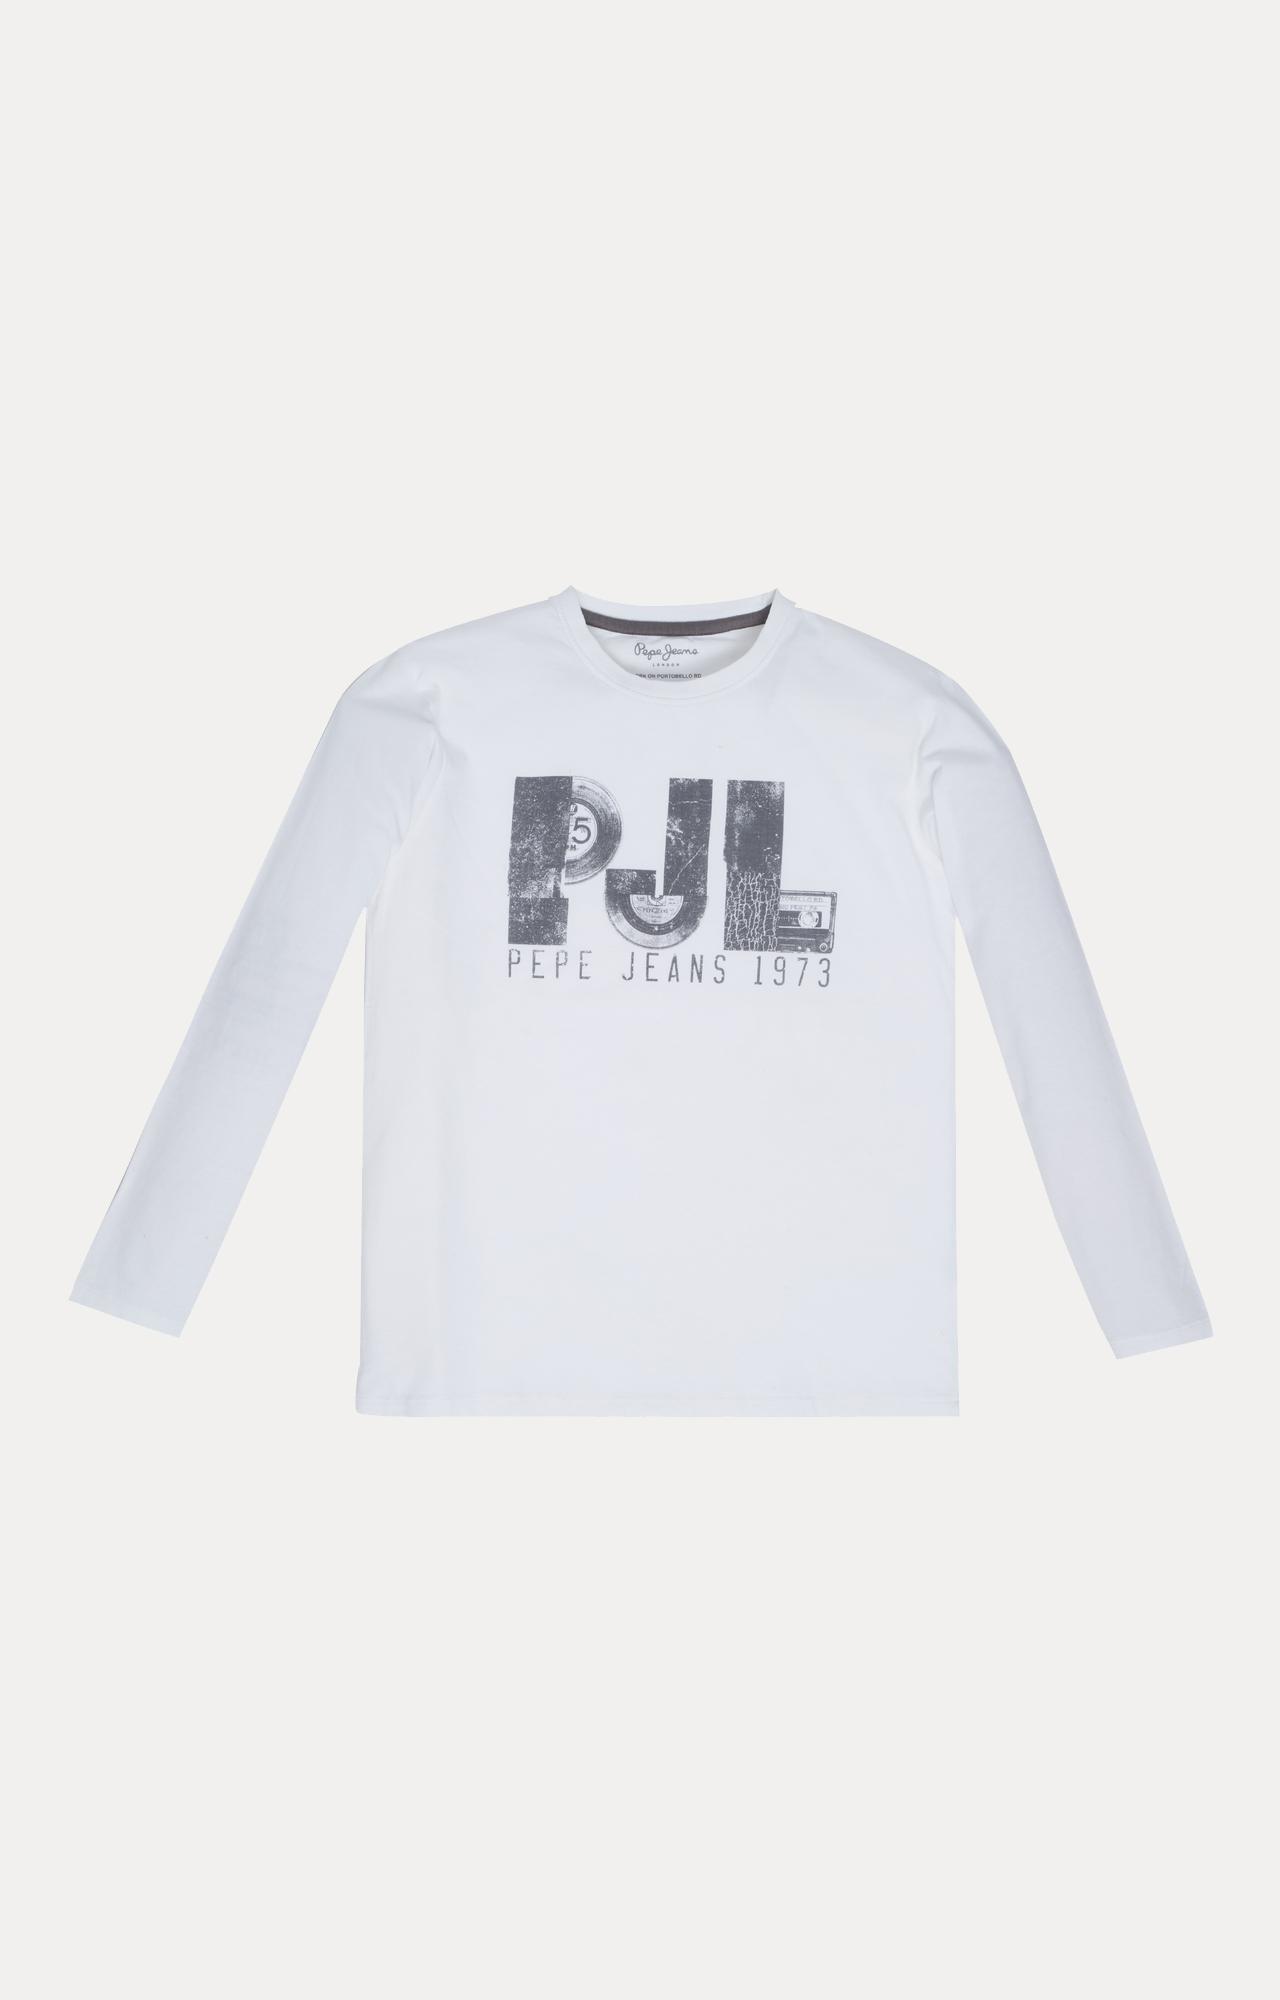 Pepe Jeans   White Printed T-Shirt